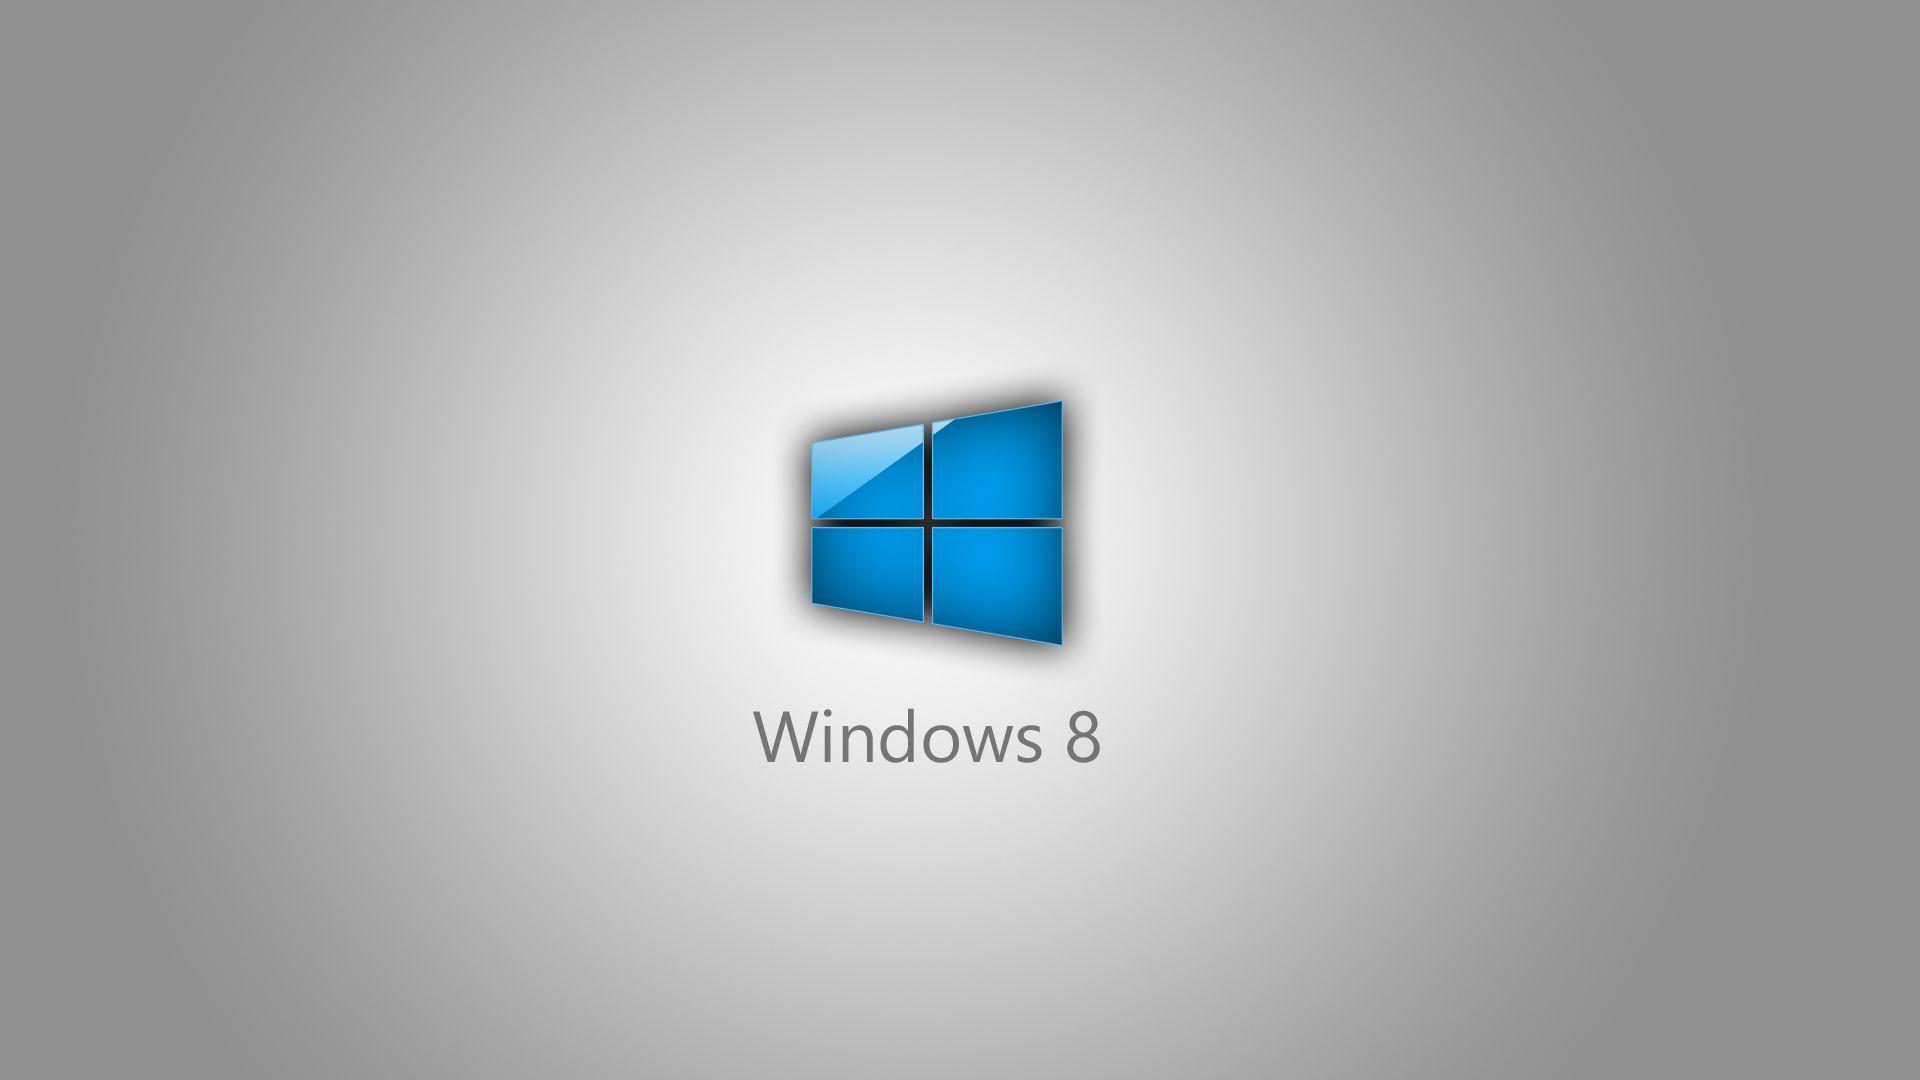 Windows 8 Hd Wallpapers